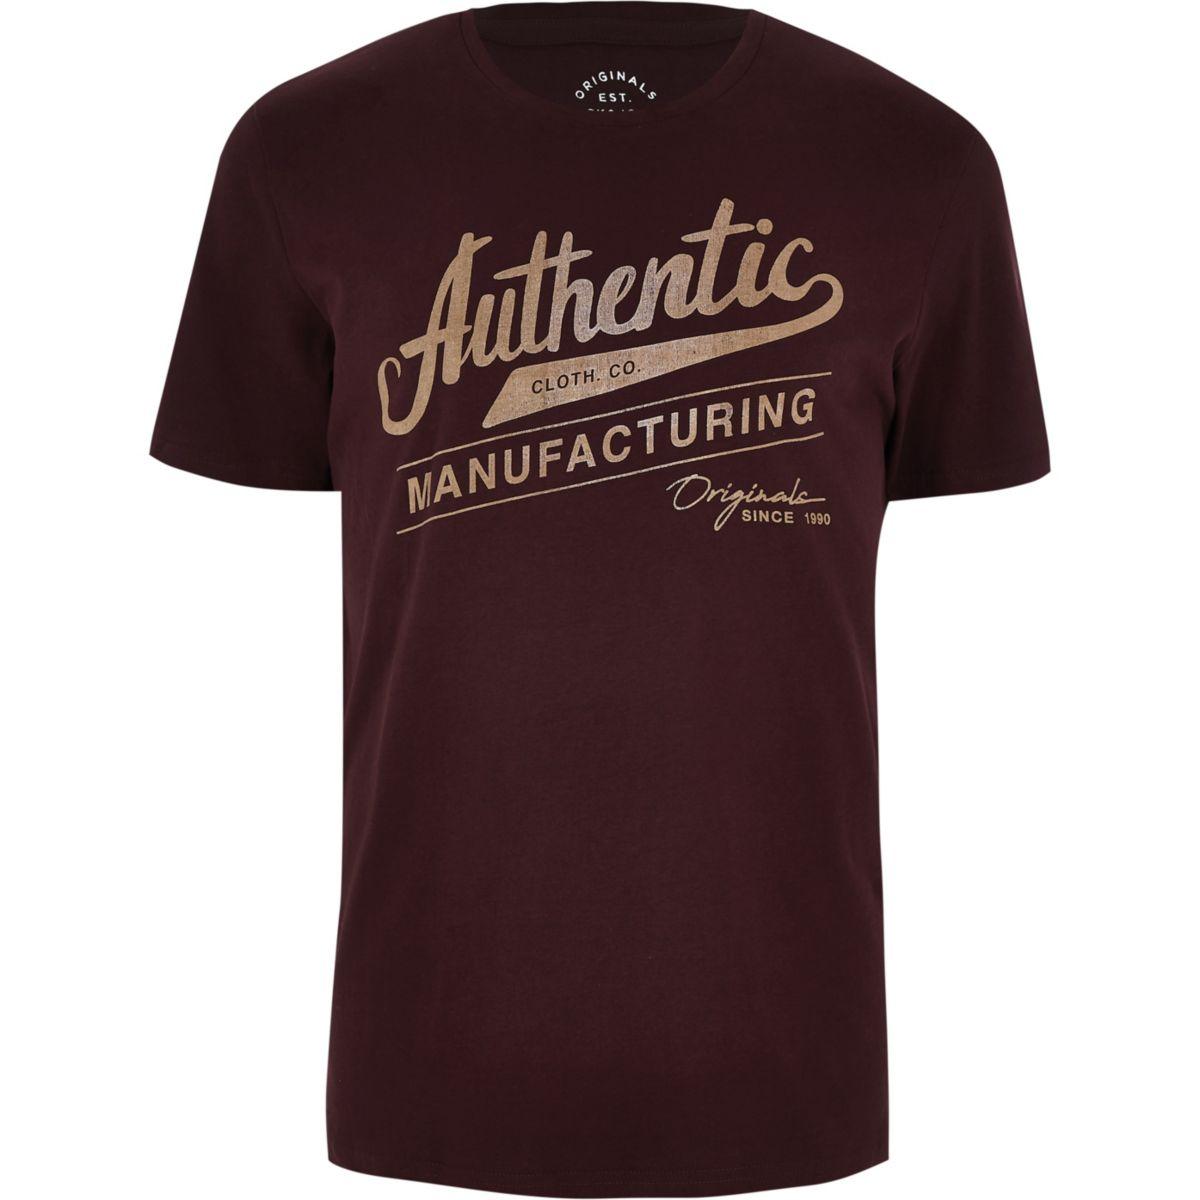 Jack & Jones dark red 'authentic' T-shirt